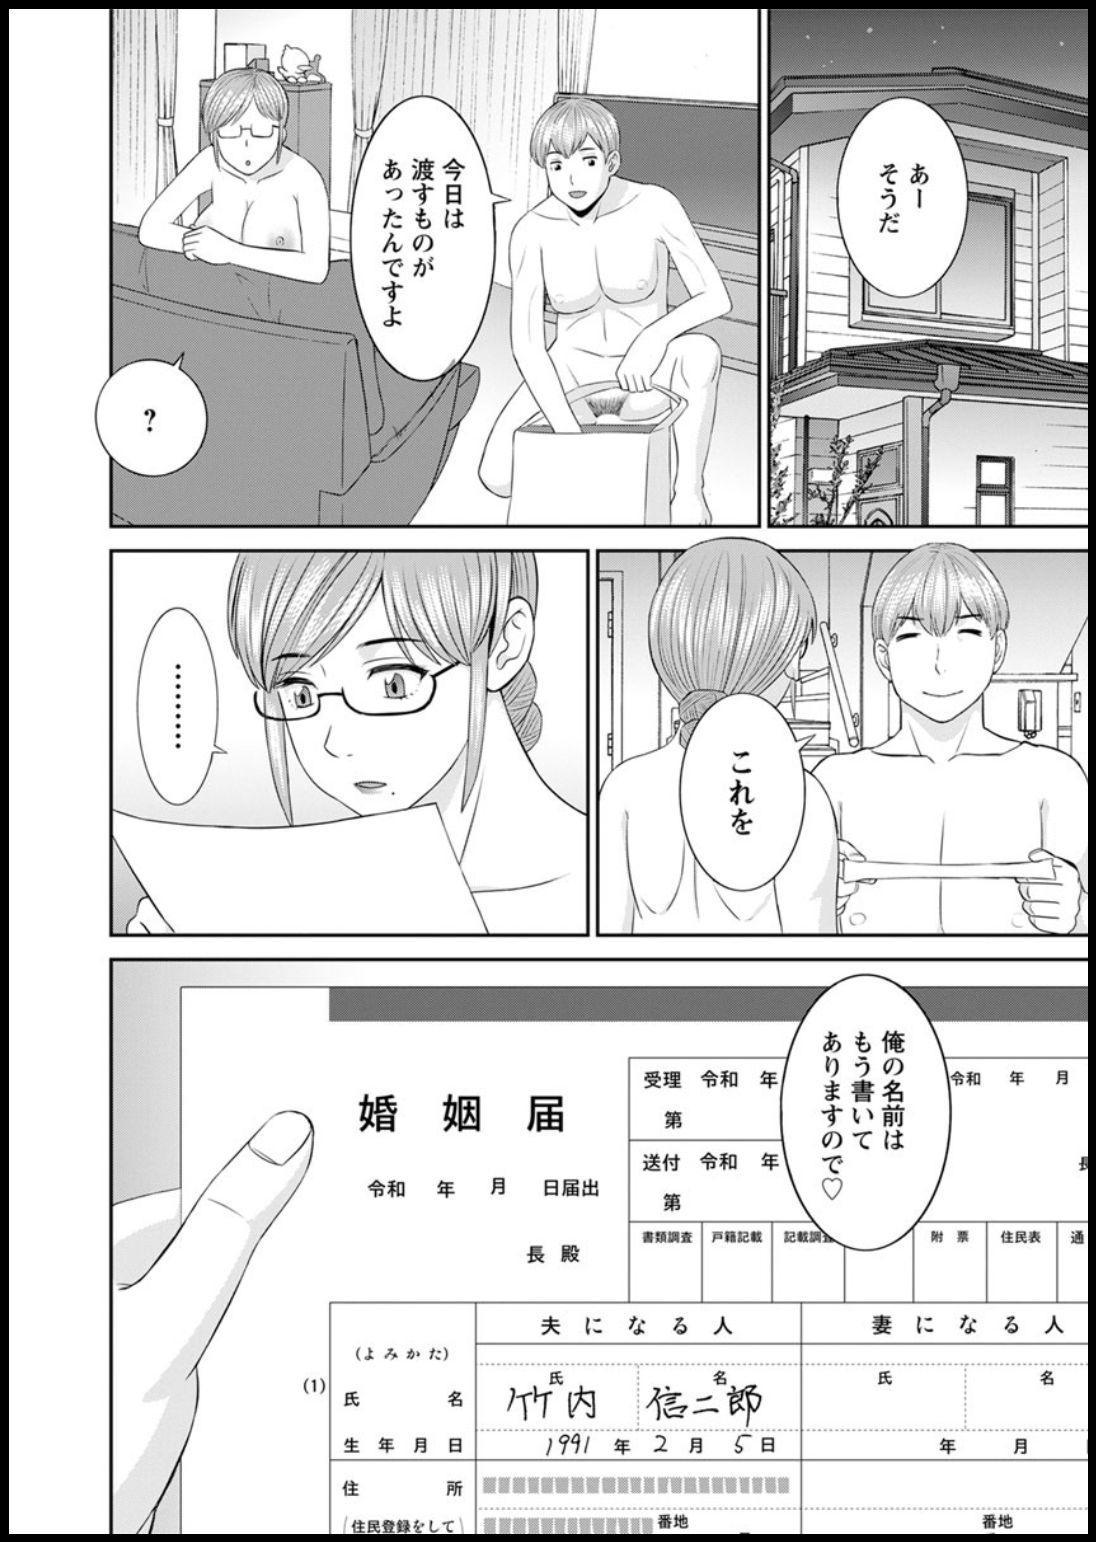 [Kawamori Misaki] Kaikan Hitotsuma Gakuen Ch. 1-6, 8-16 [Digital] 163